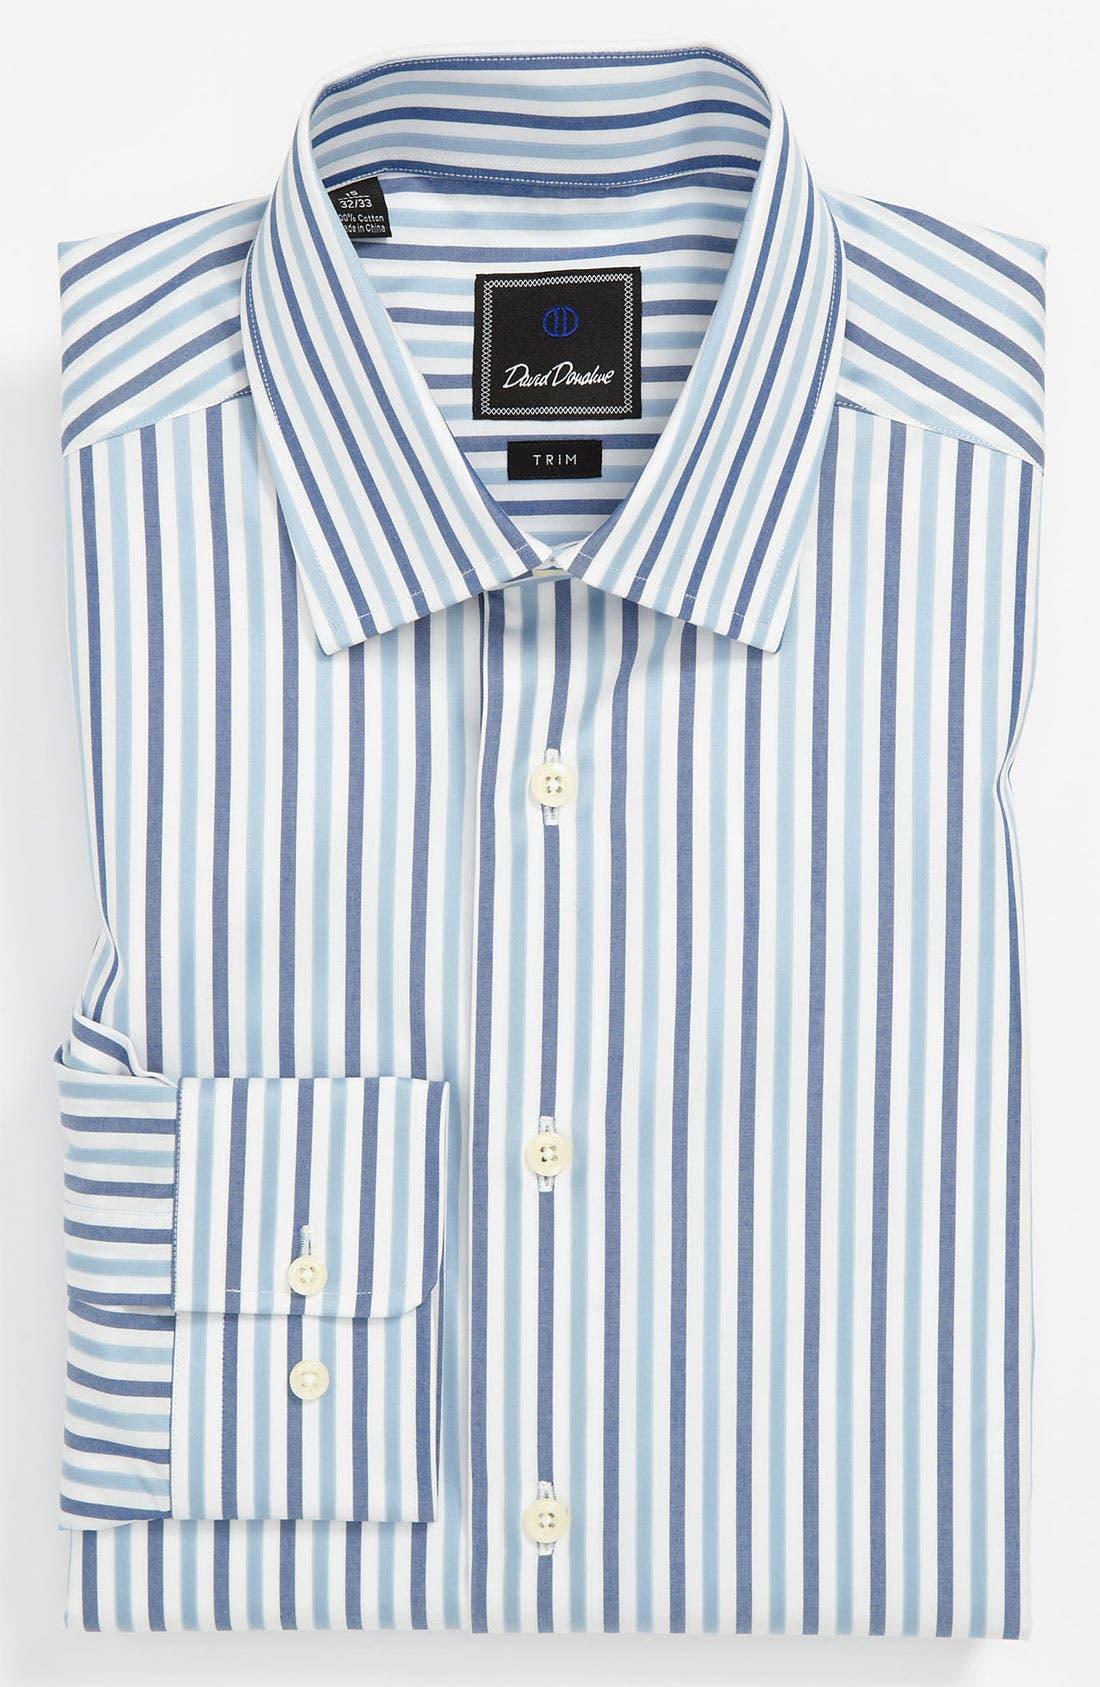 Alternate Image 1 Selected - David Donahue Trim Fit Dress Shirt (Online Exclusive)